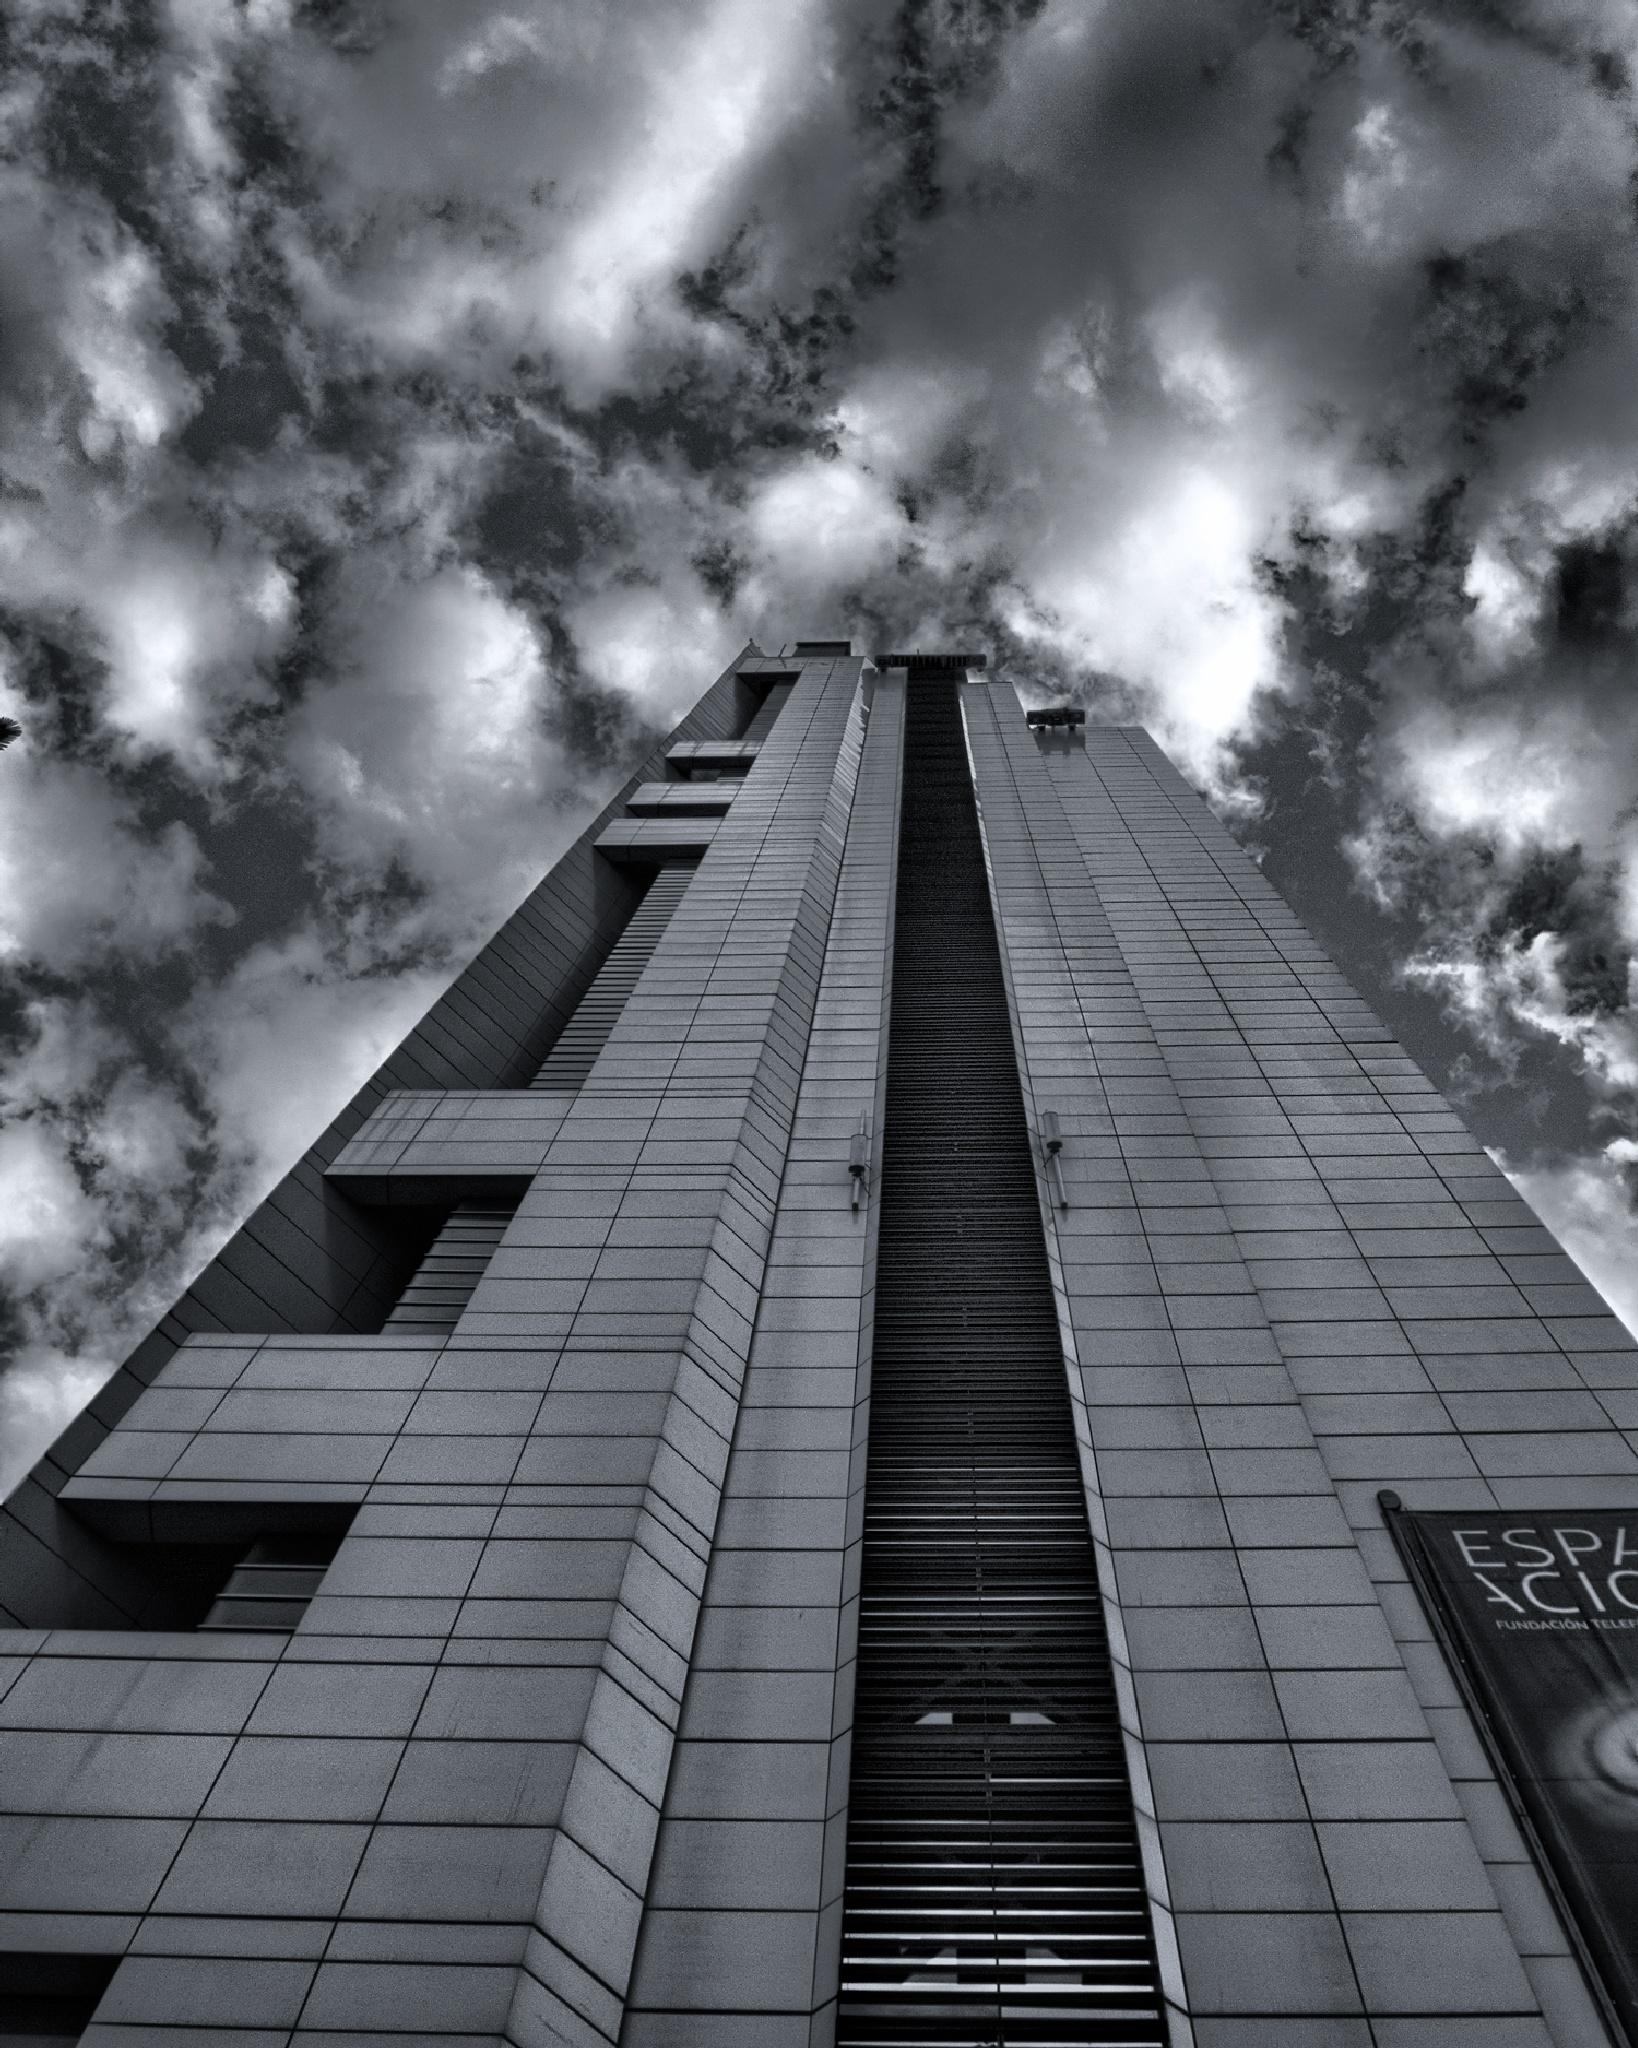 Santiago de chile by Camilo Towers